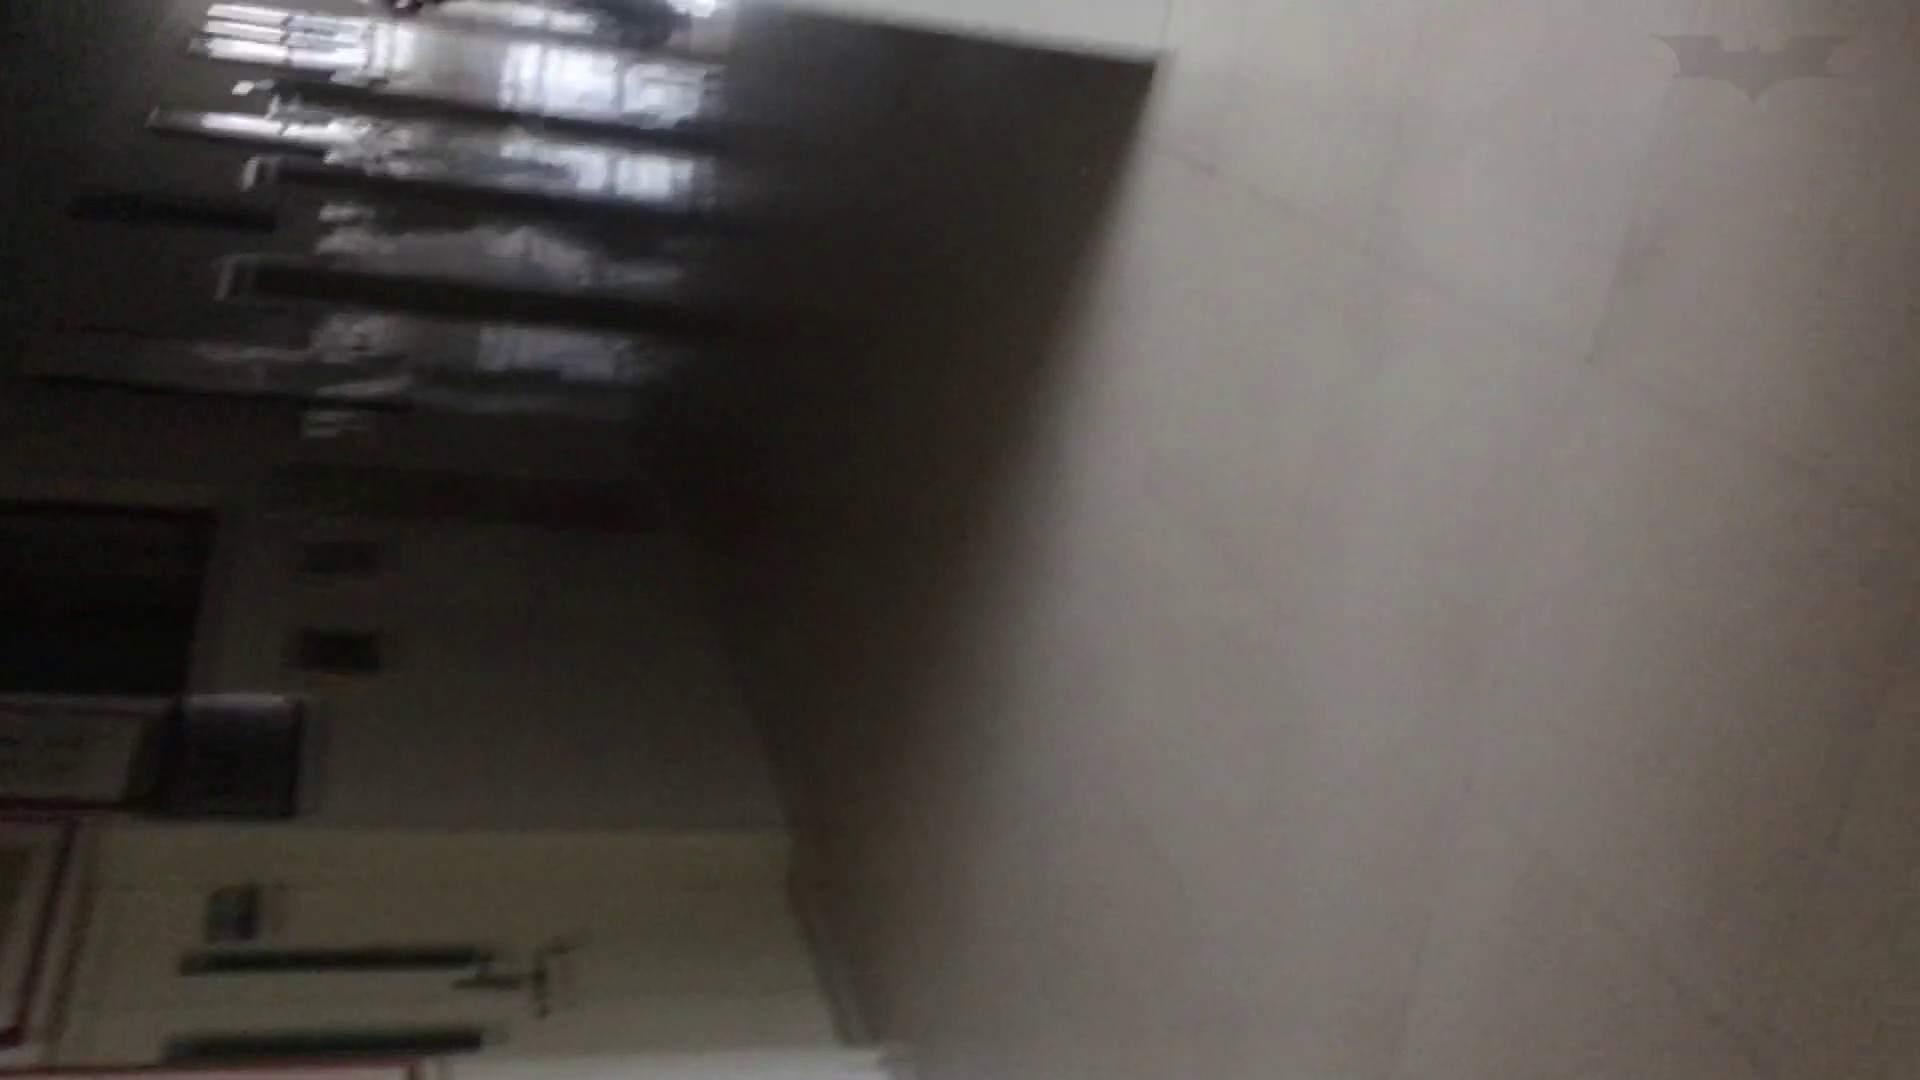 芸術大学ガチ潜入盗撮 JD盗撮 美女の洗面所の秘密 Vol.80 美肌 スケベ動画紹介 69画像 53